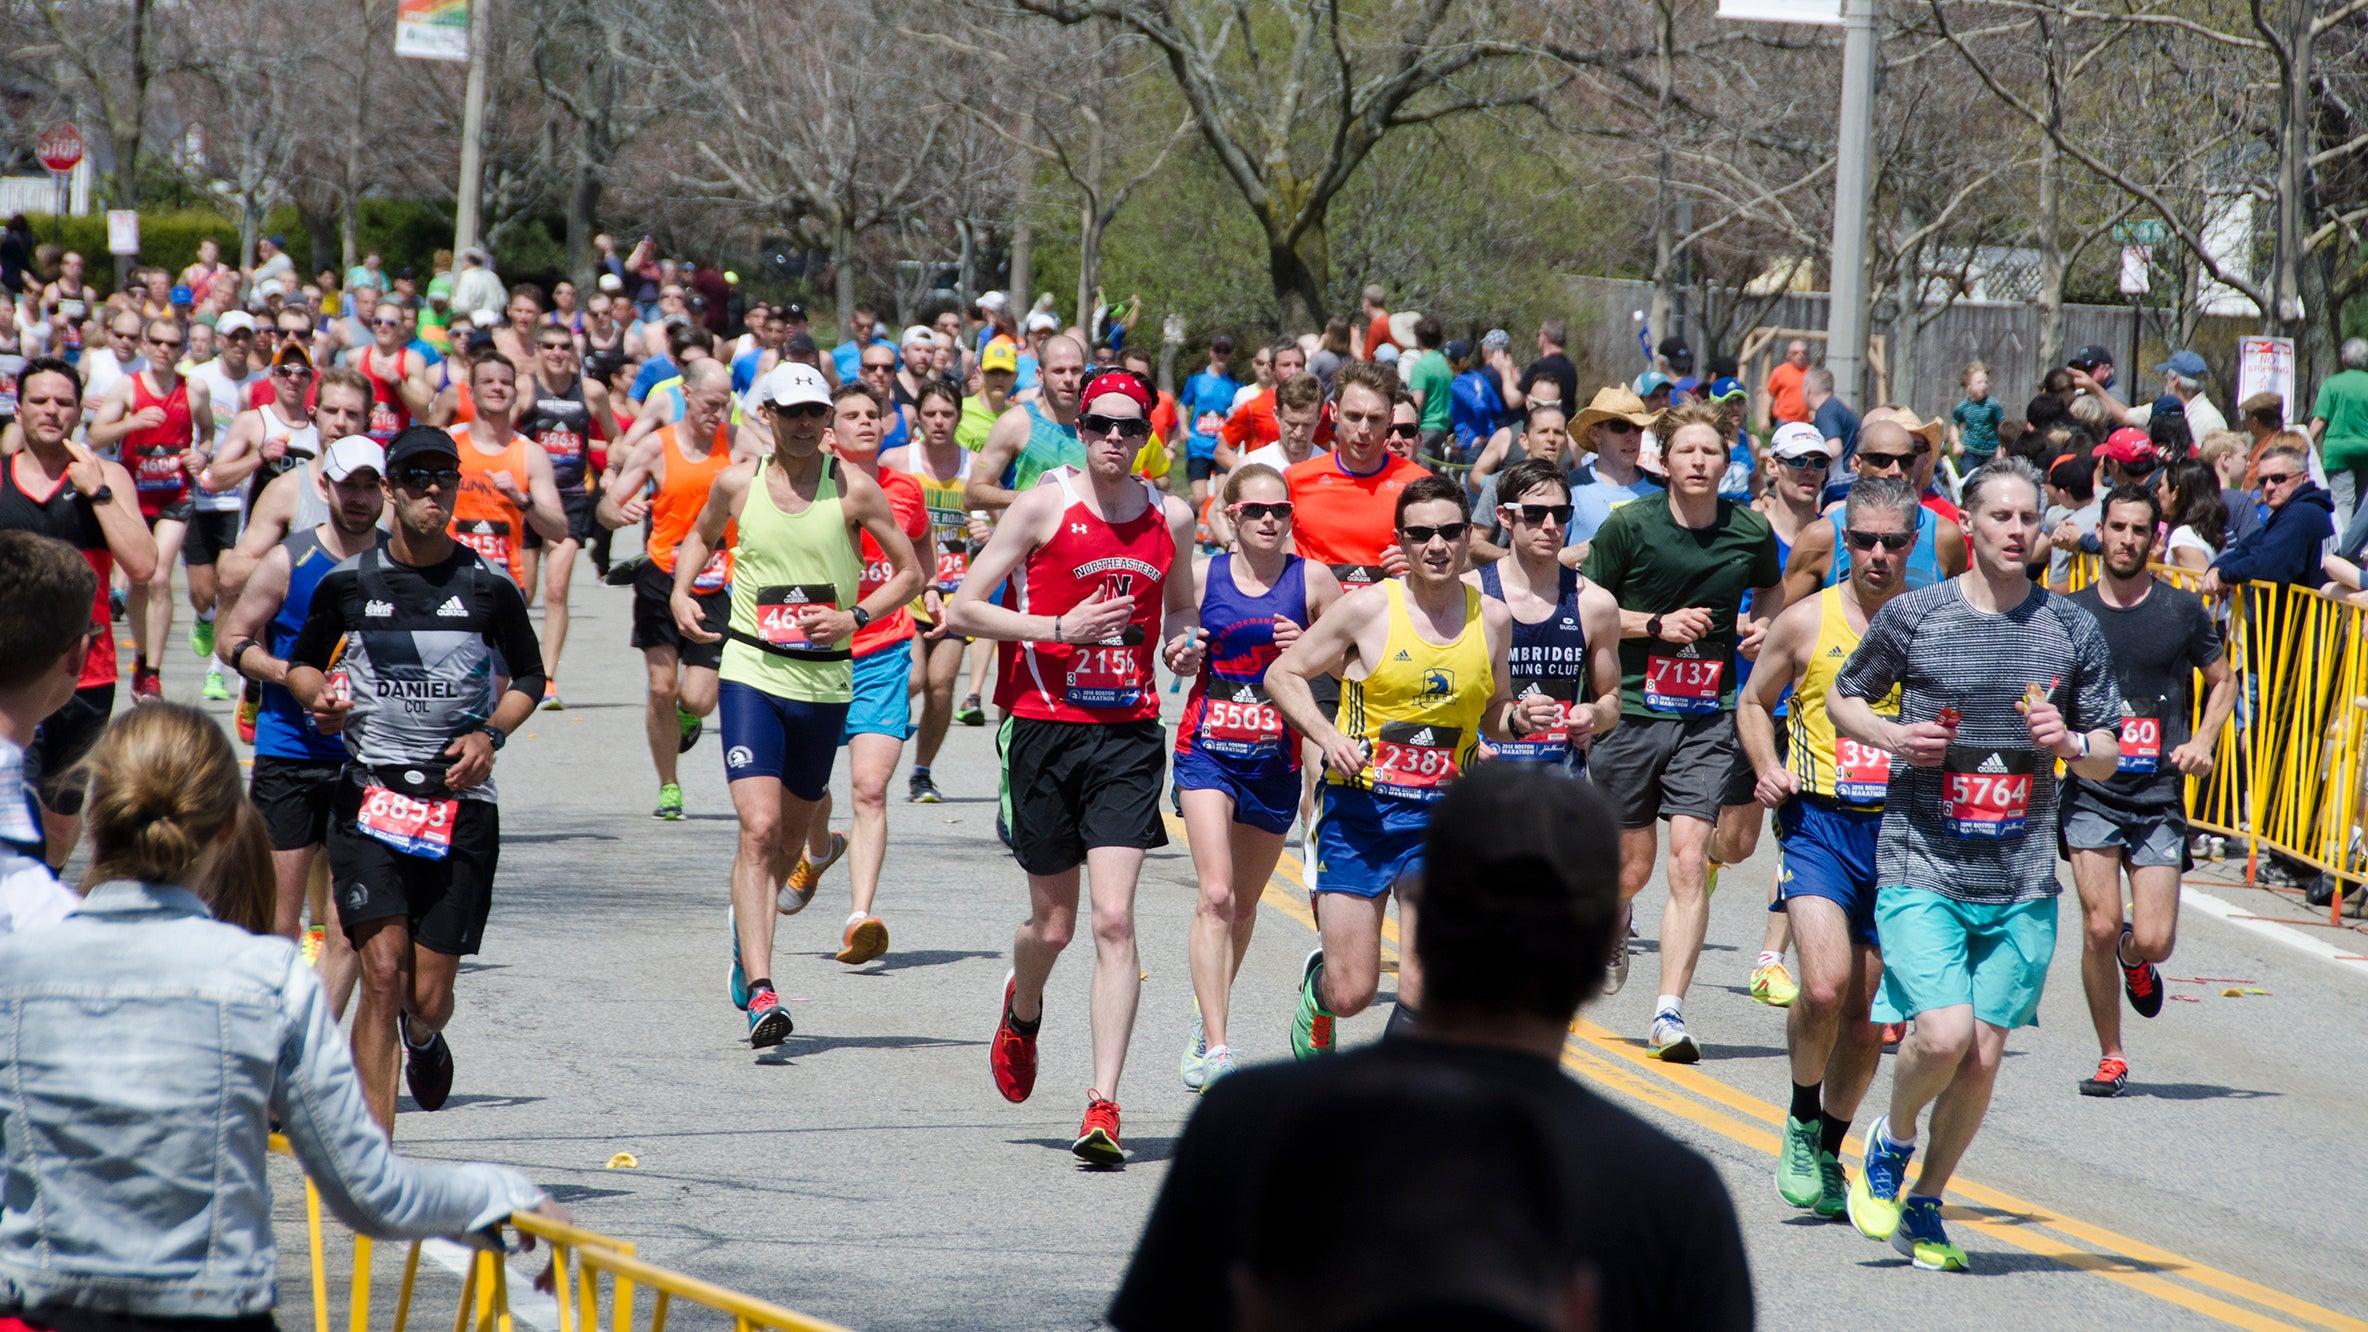 Boston Marathon runners running at mile 20